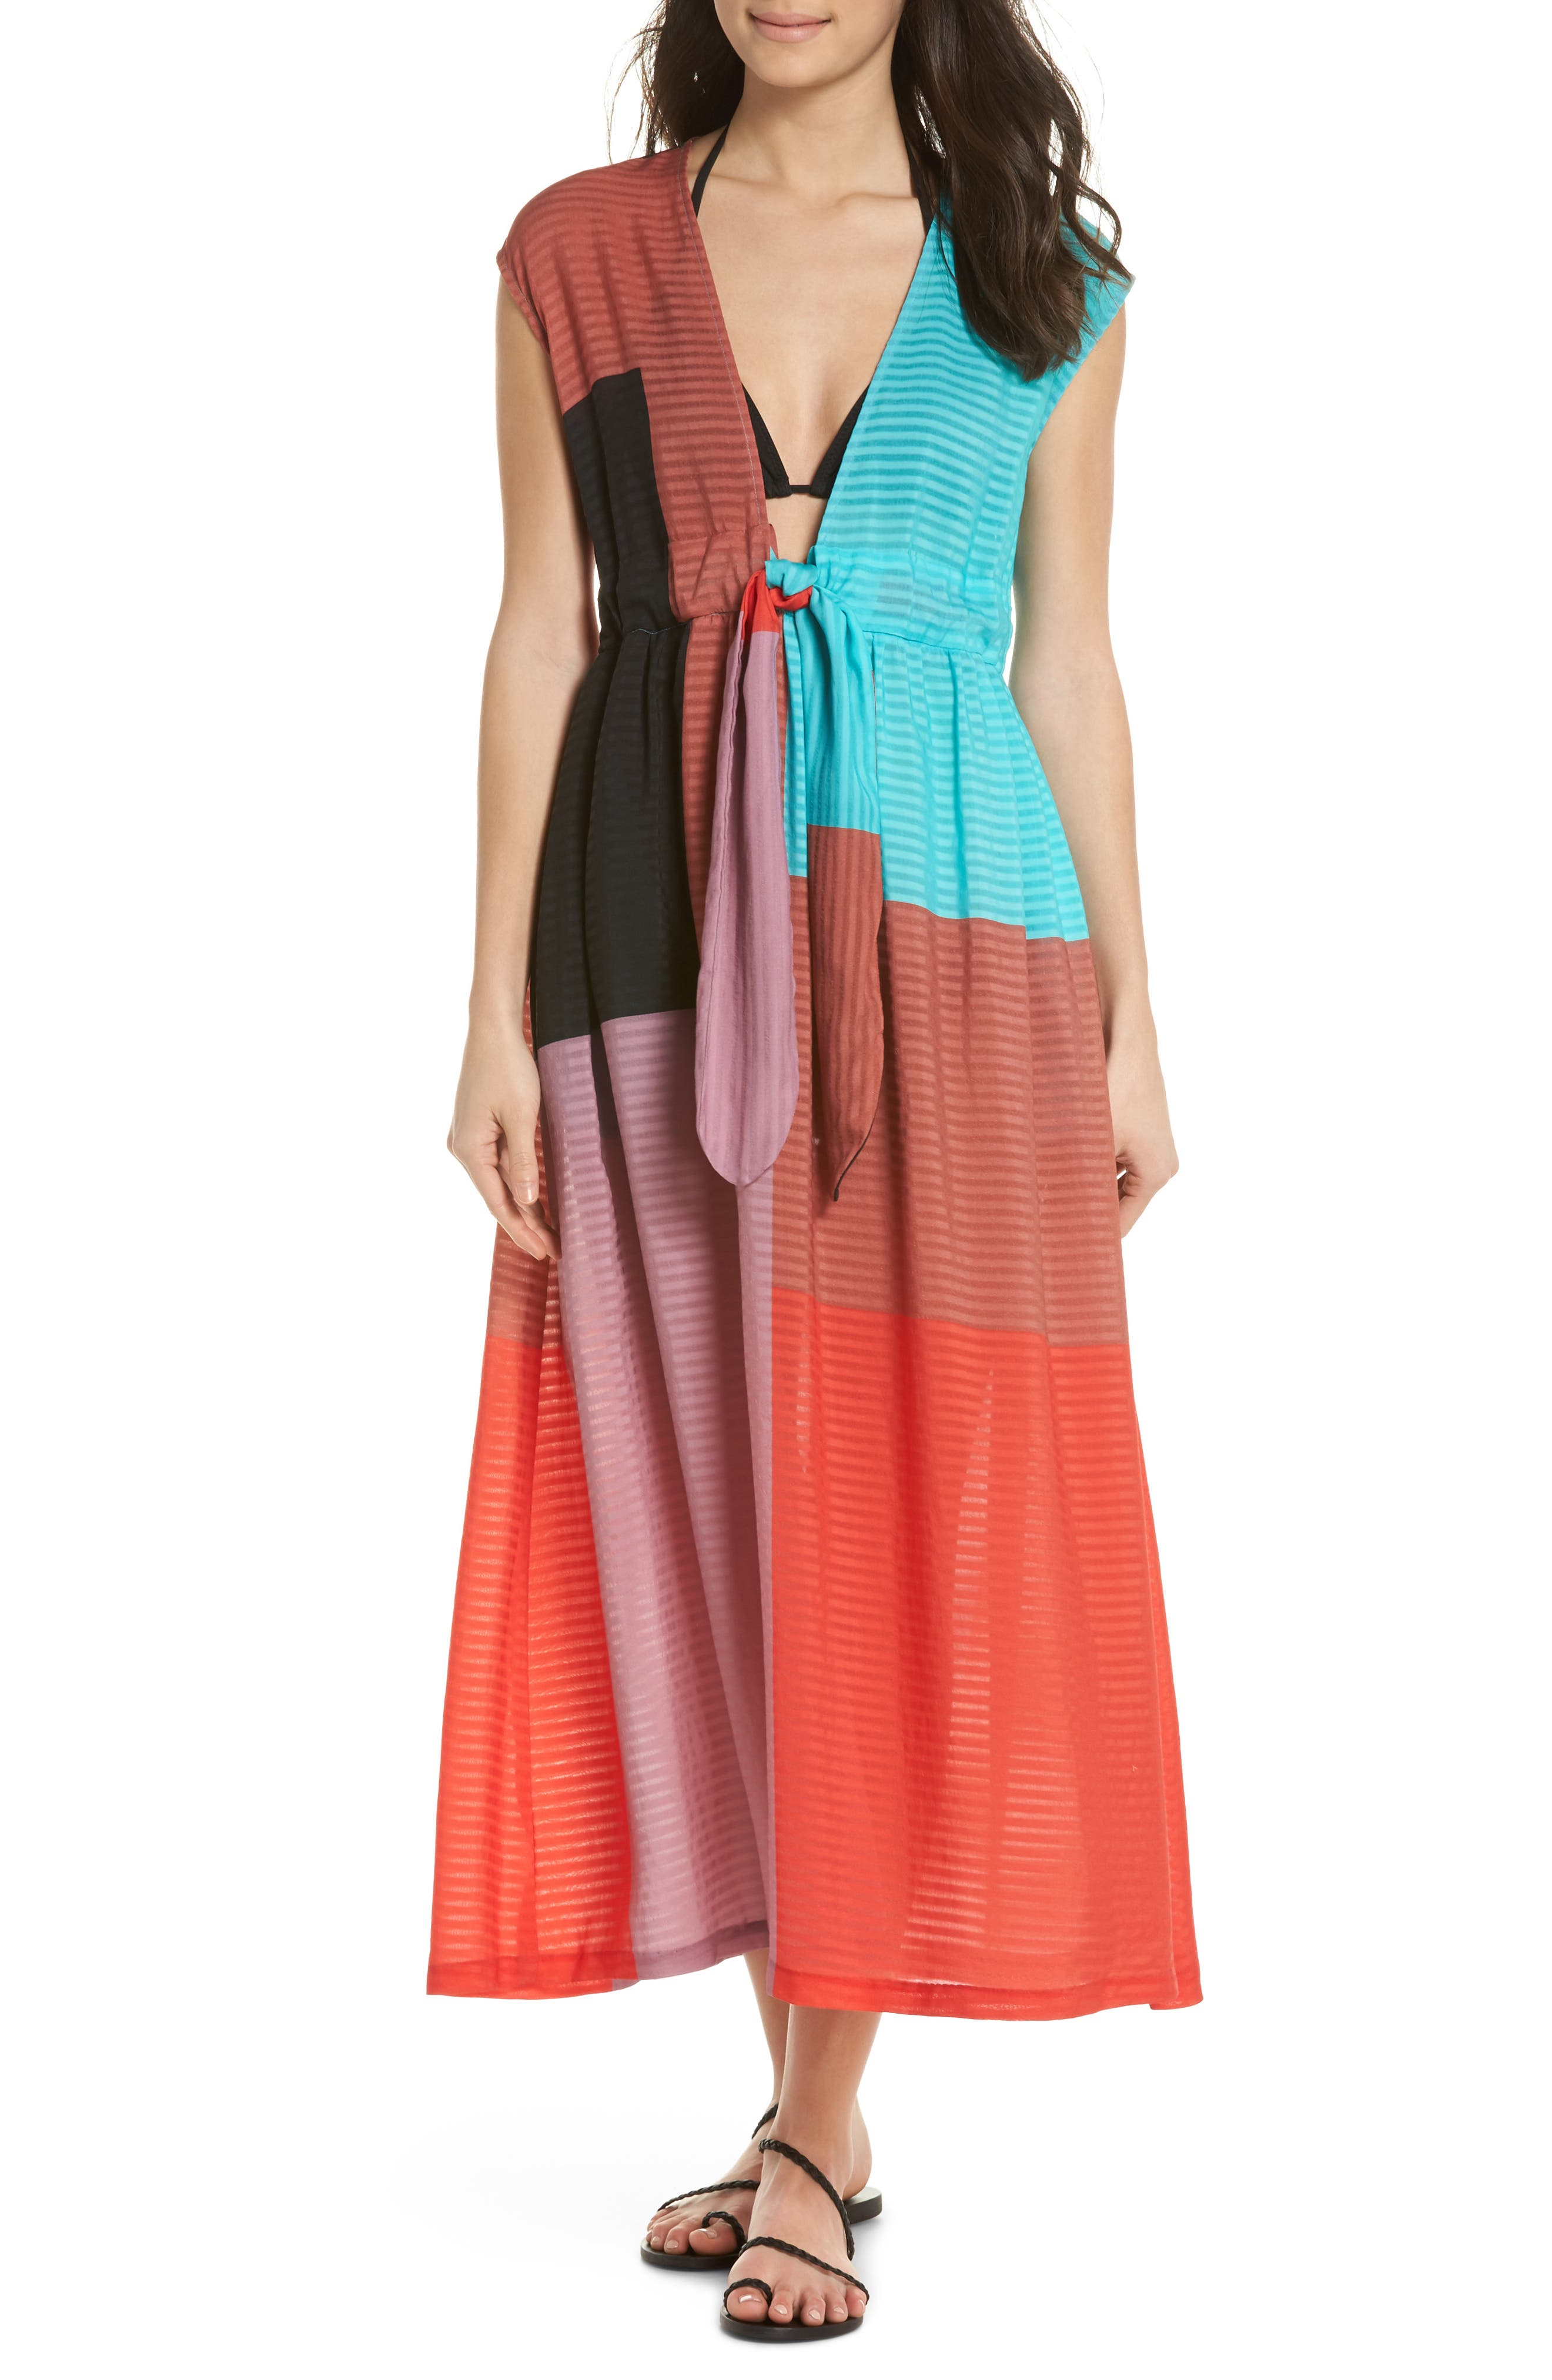 Alternate Image 1 Selected - Mara Hoffman Katinka Cover-Up Dress